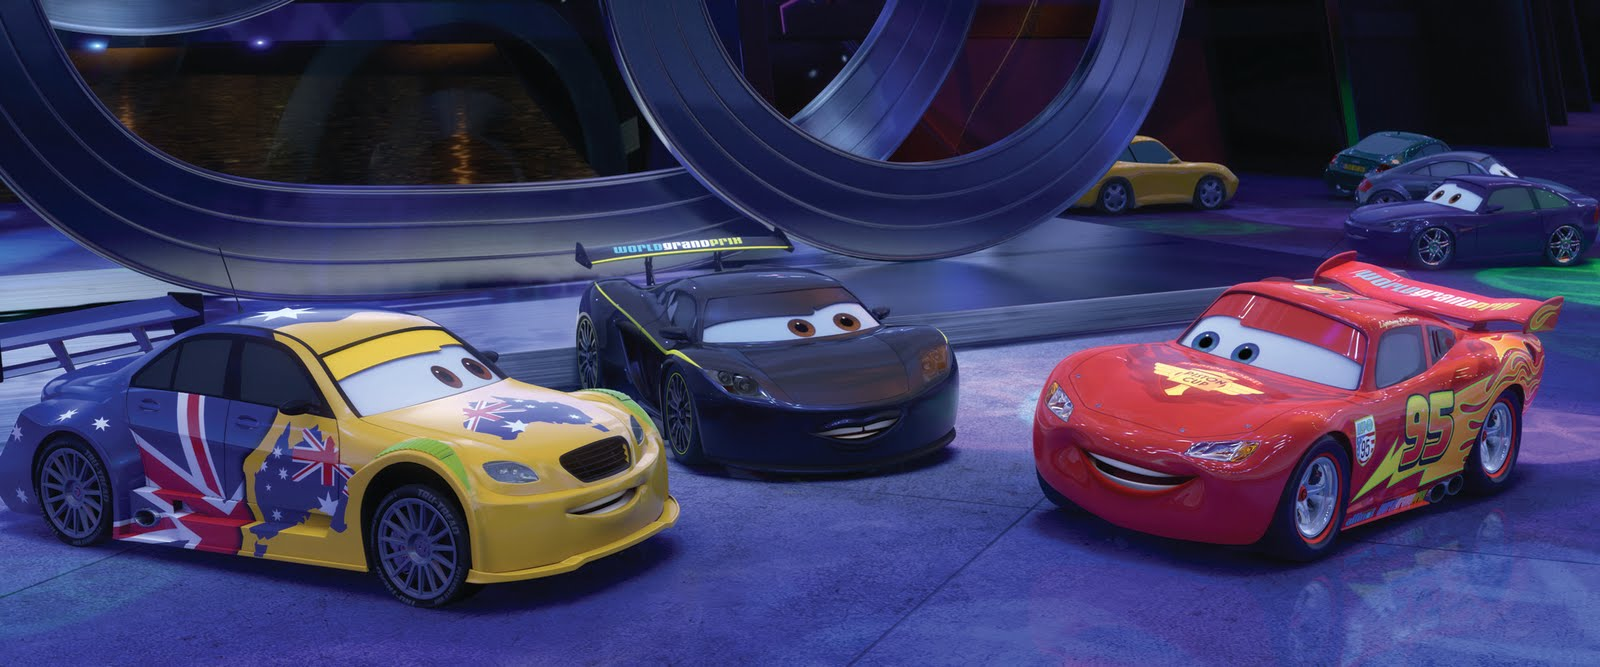 Localization In Cars 2 Pixar Post Forum